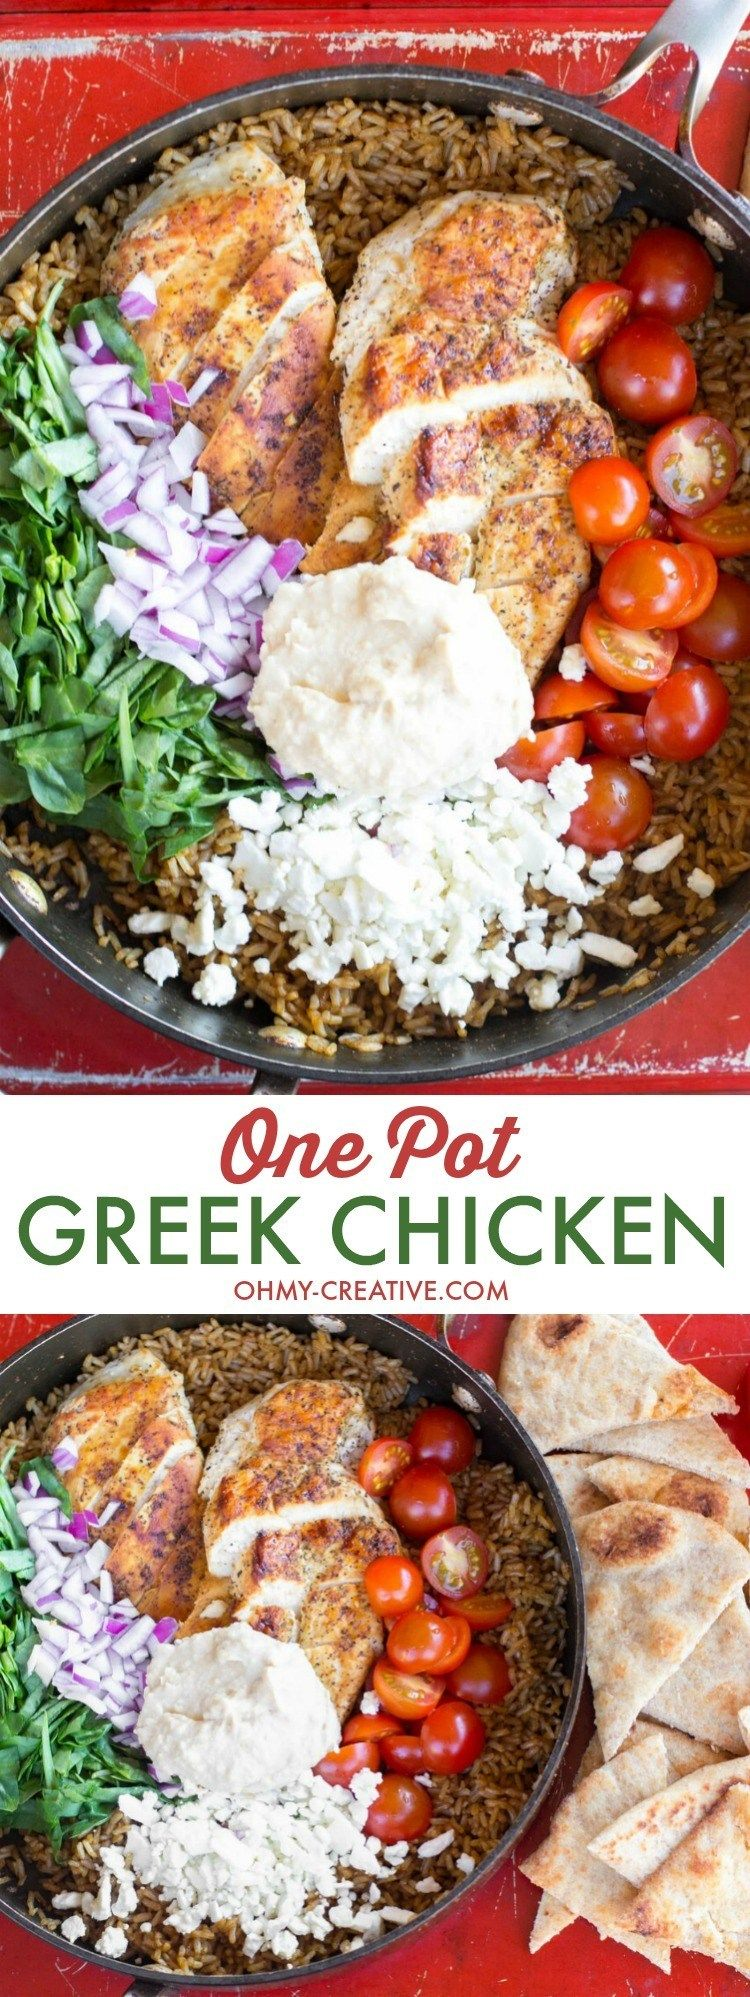 One Pot Greek Chicken and Rice #seasonedricerecipes